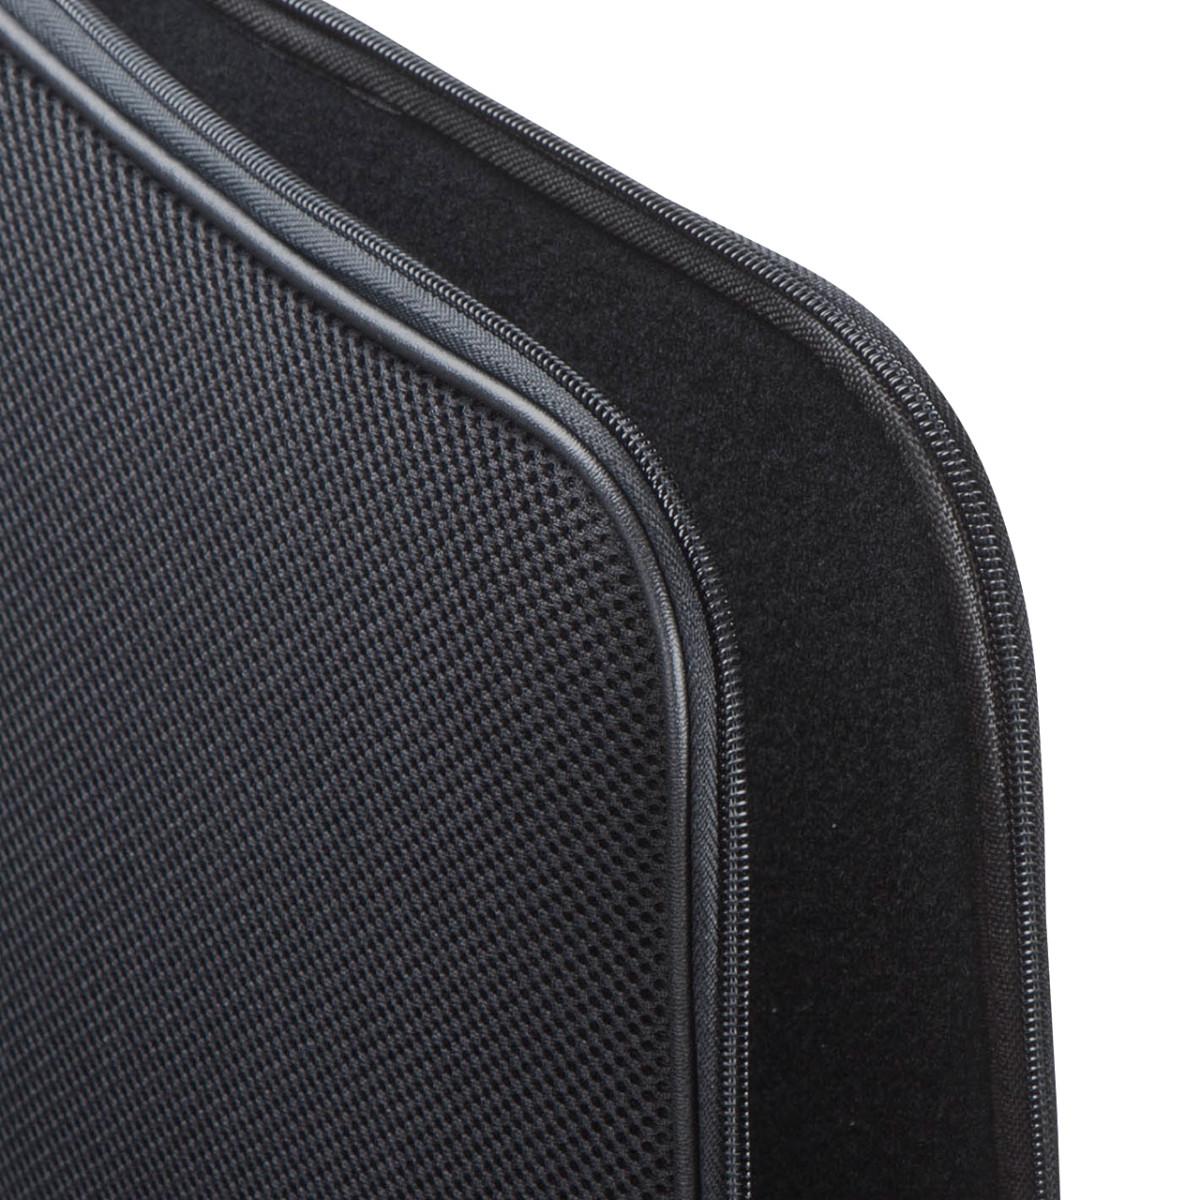 [IN-SG17BK] 【代引き不可】低反発3Dメッシュケース(17.3インチ対応・ブラック)